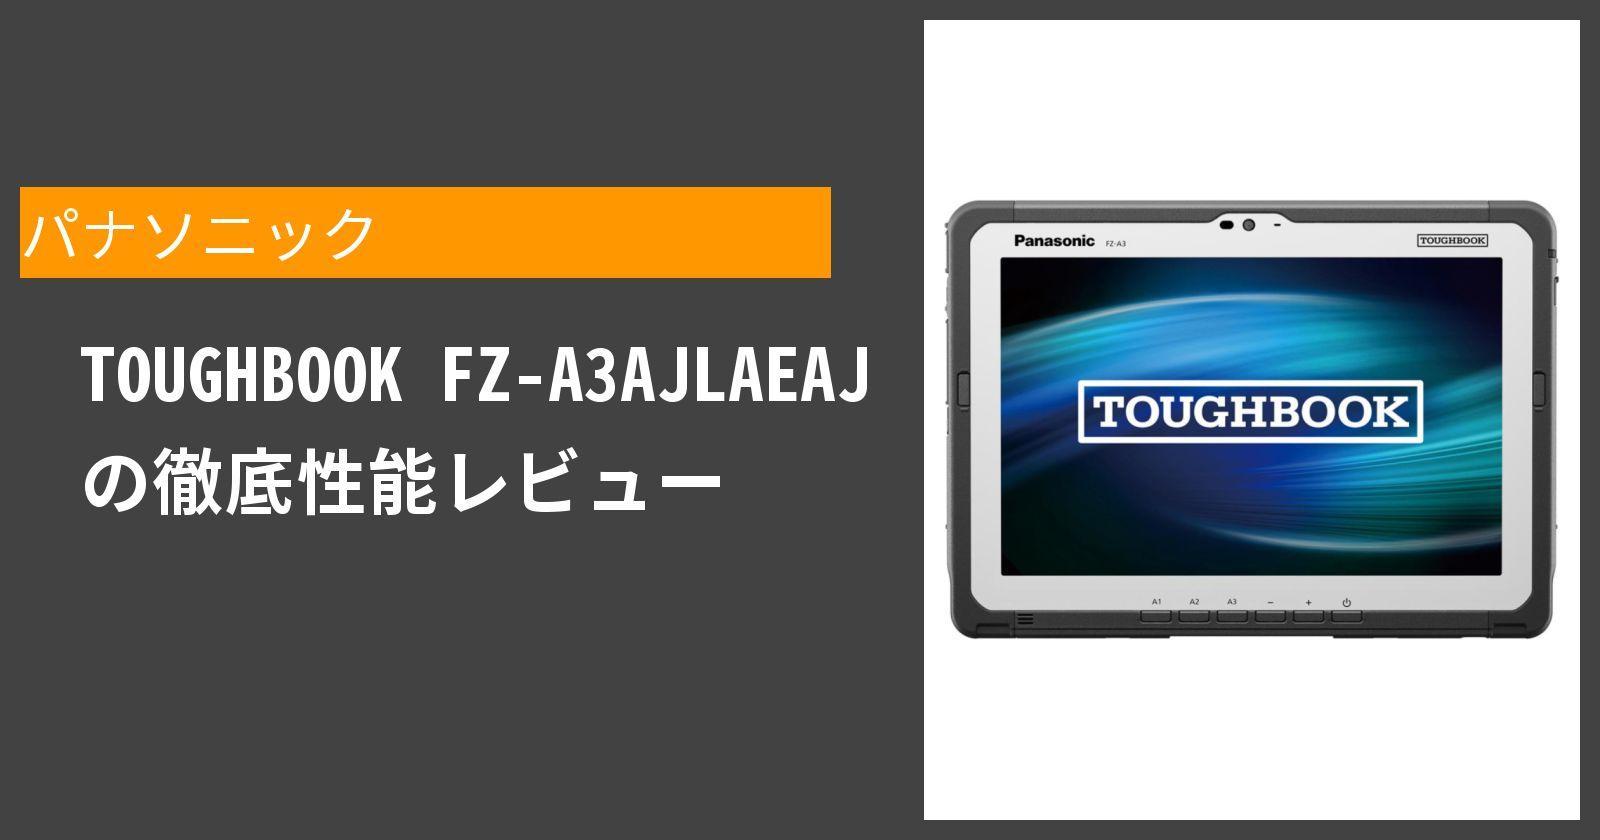 TOUGHBOOK FZ-A3AJLAEAJ の徹底性能レビュー